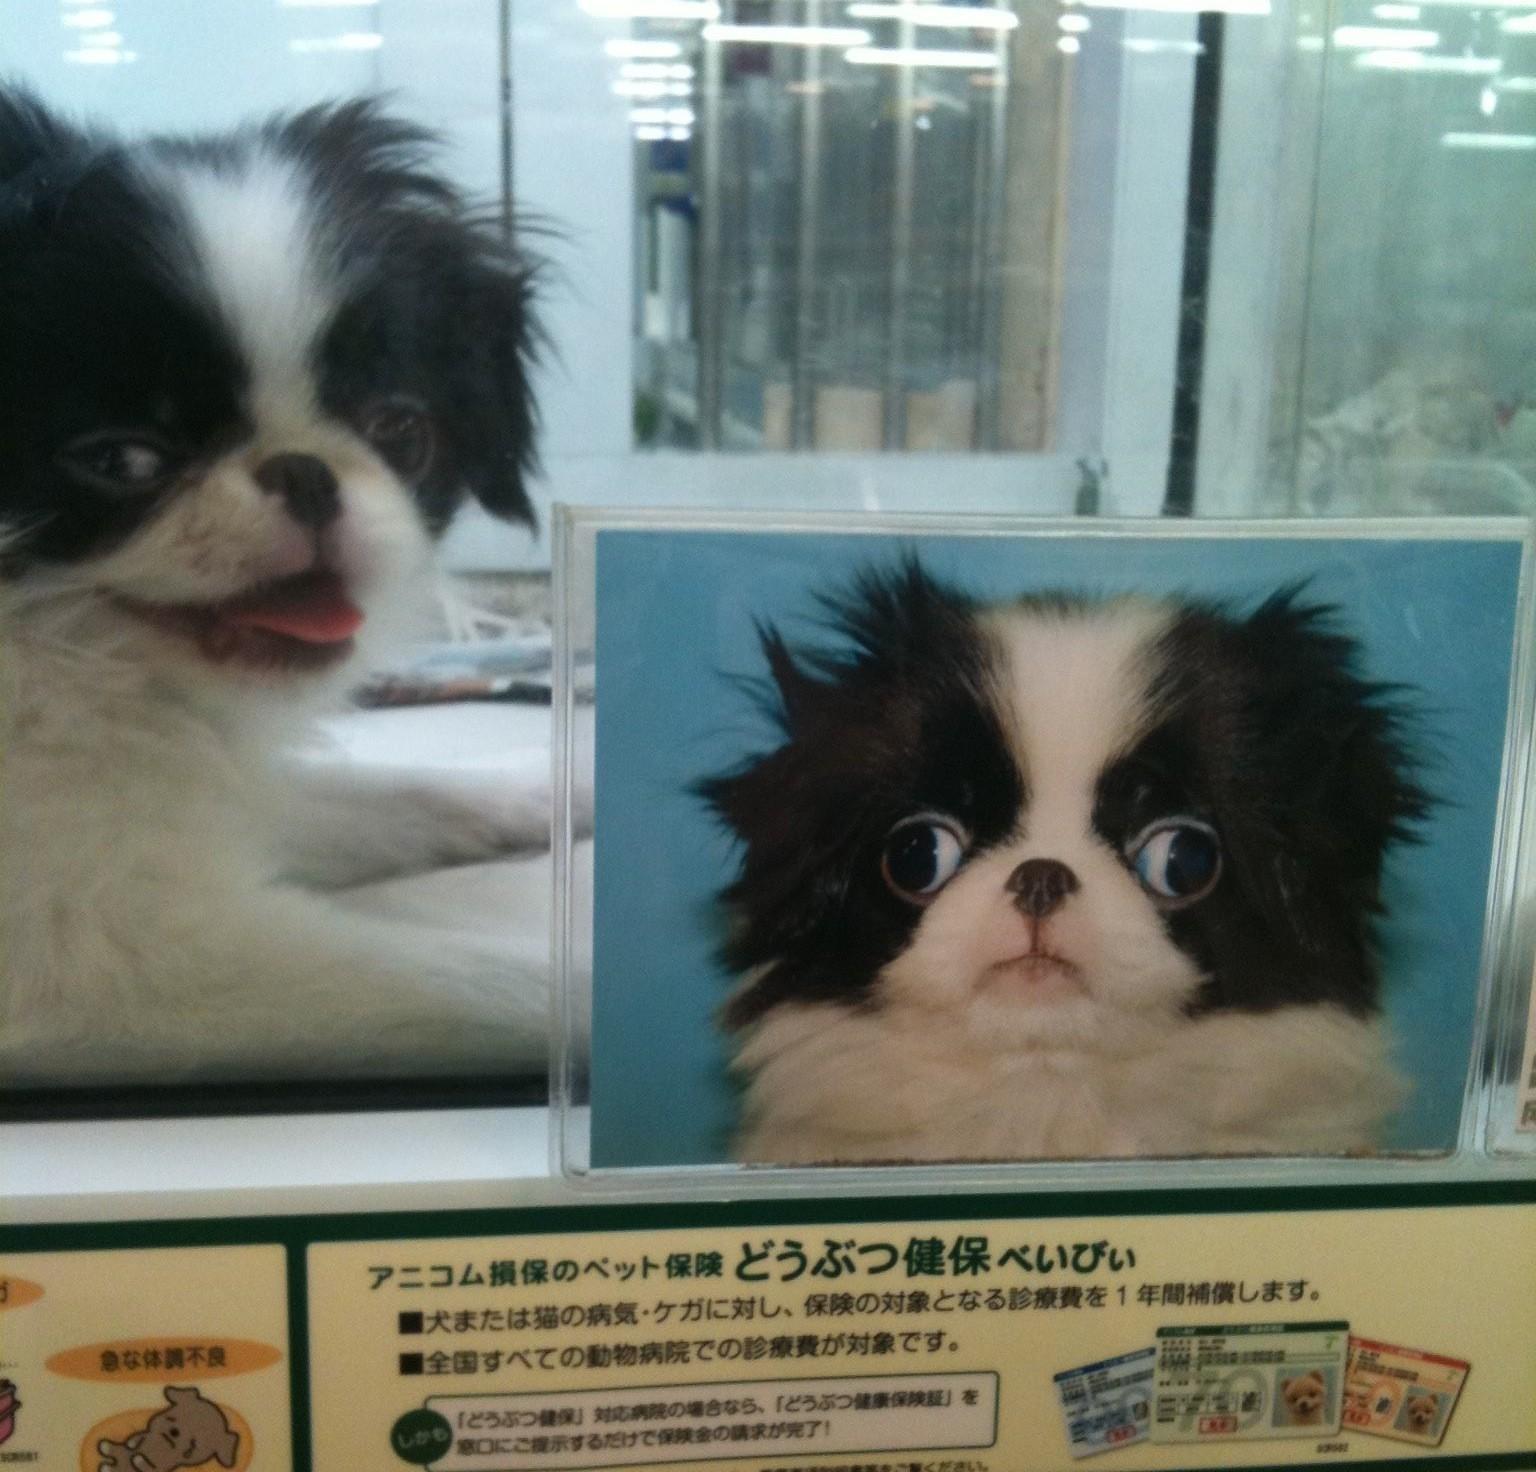 me gusta puppy - pichars.org